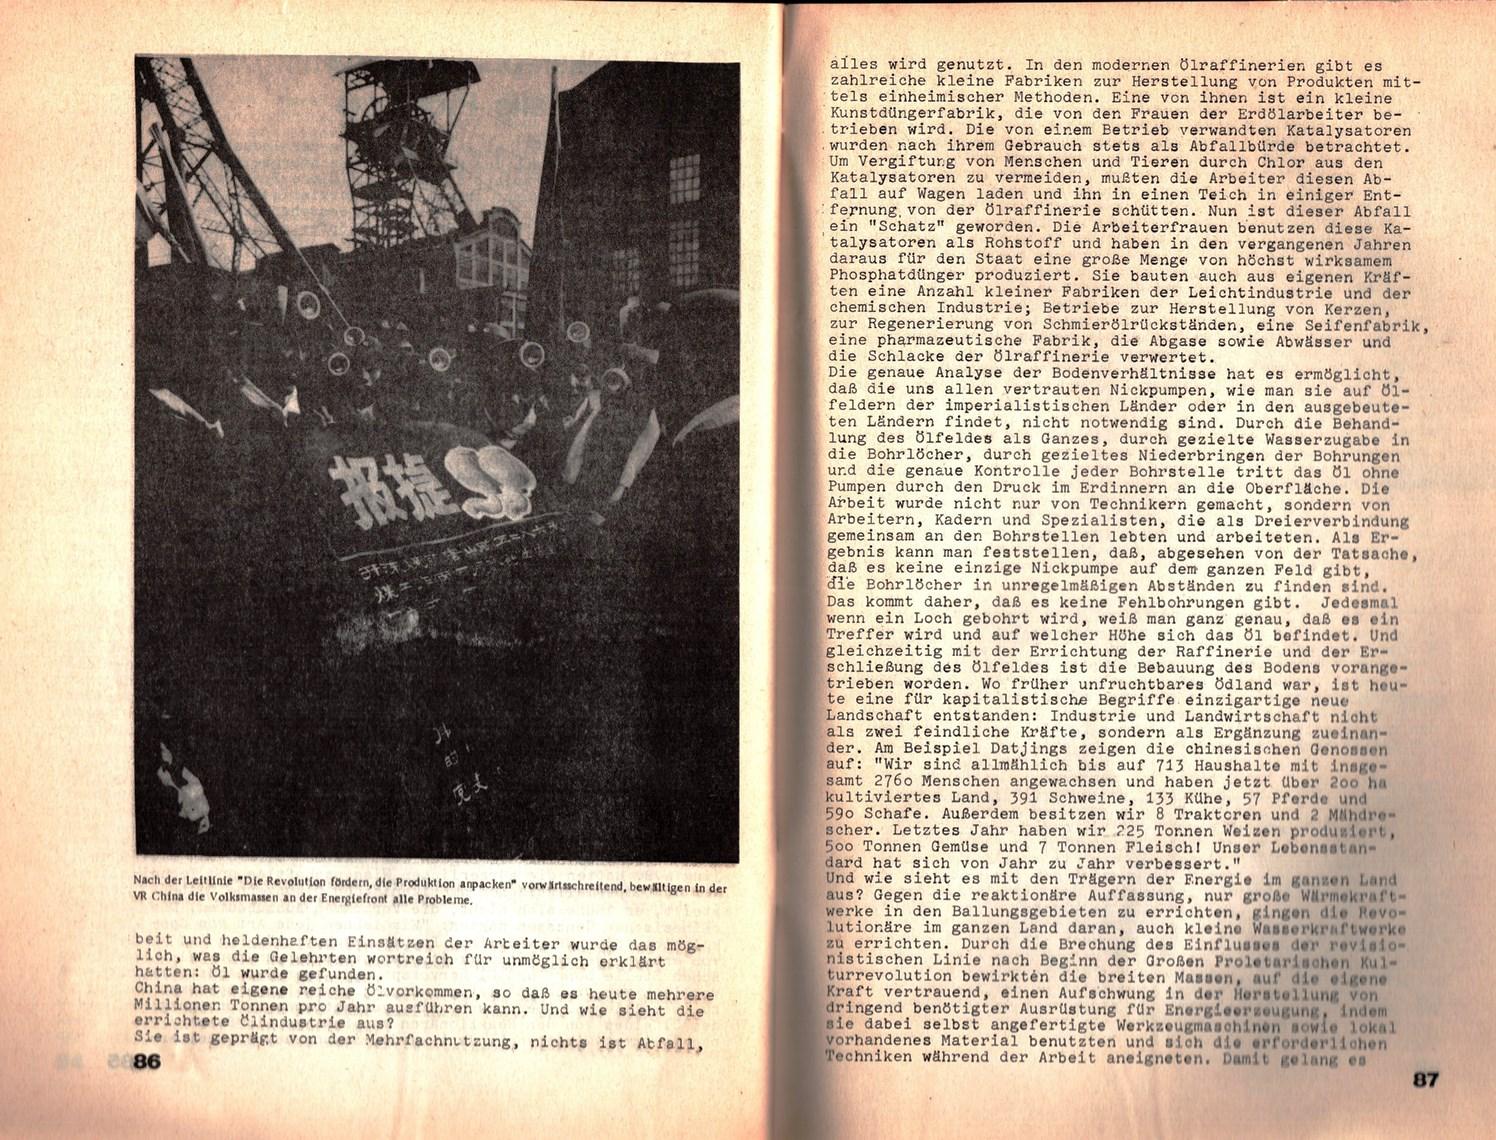 KSV_1976_Atomenergie_im_Kapitalismus_045